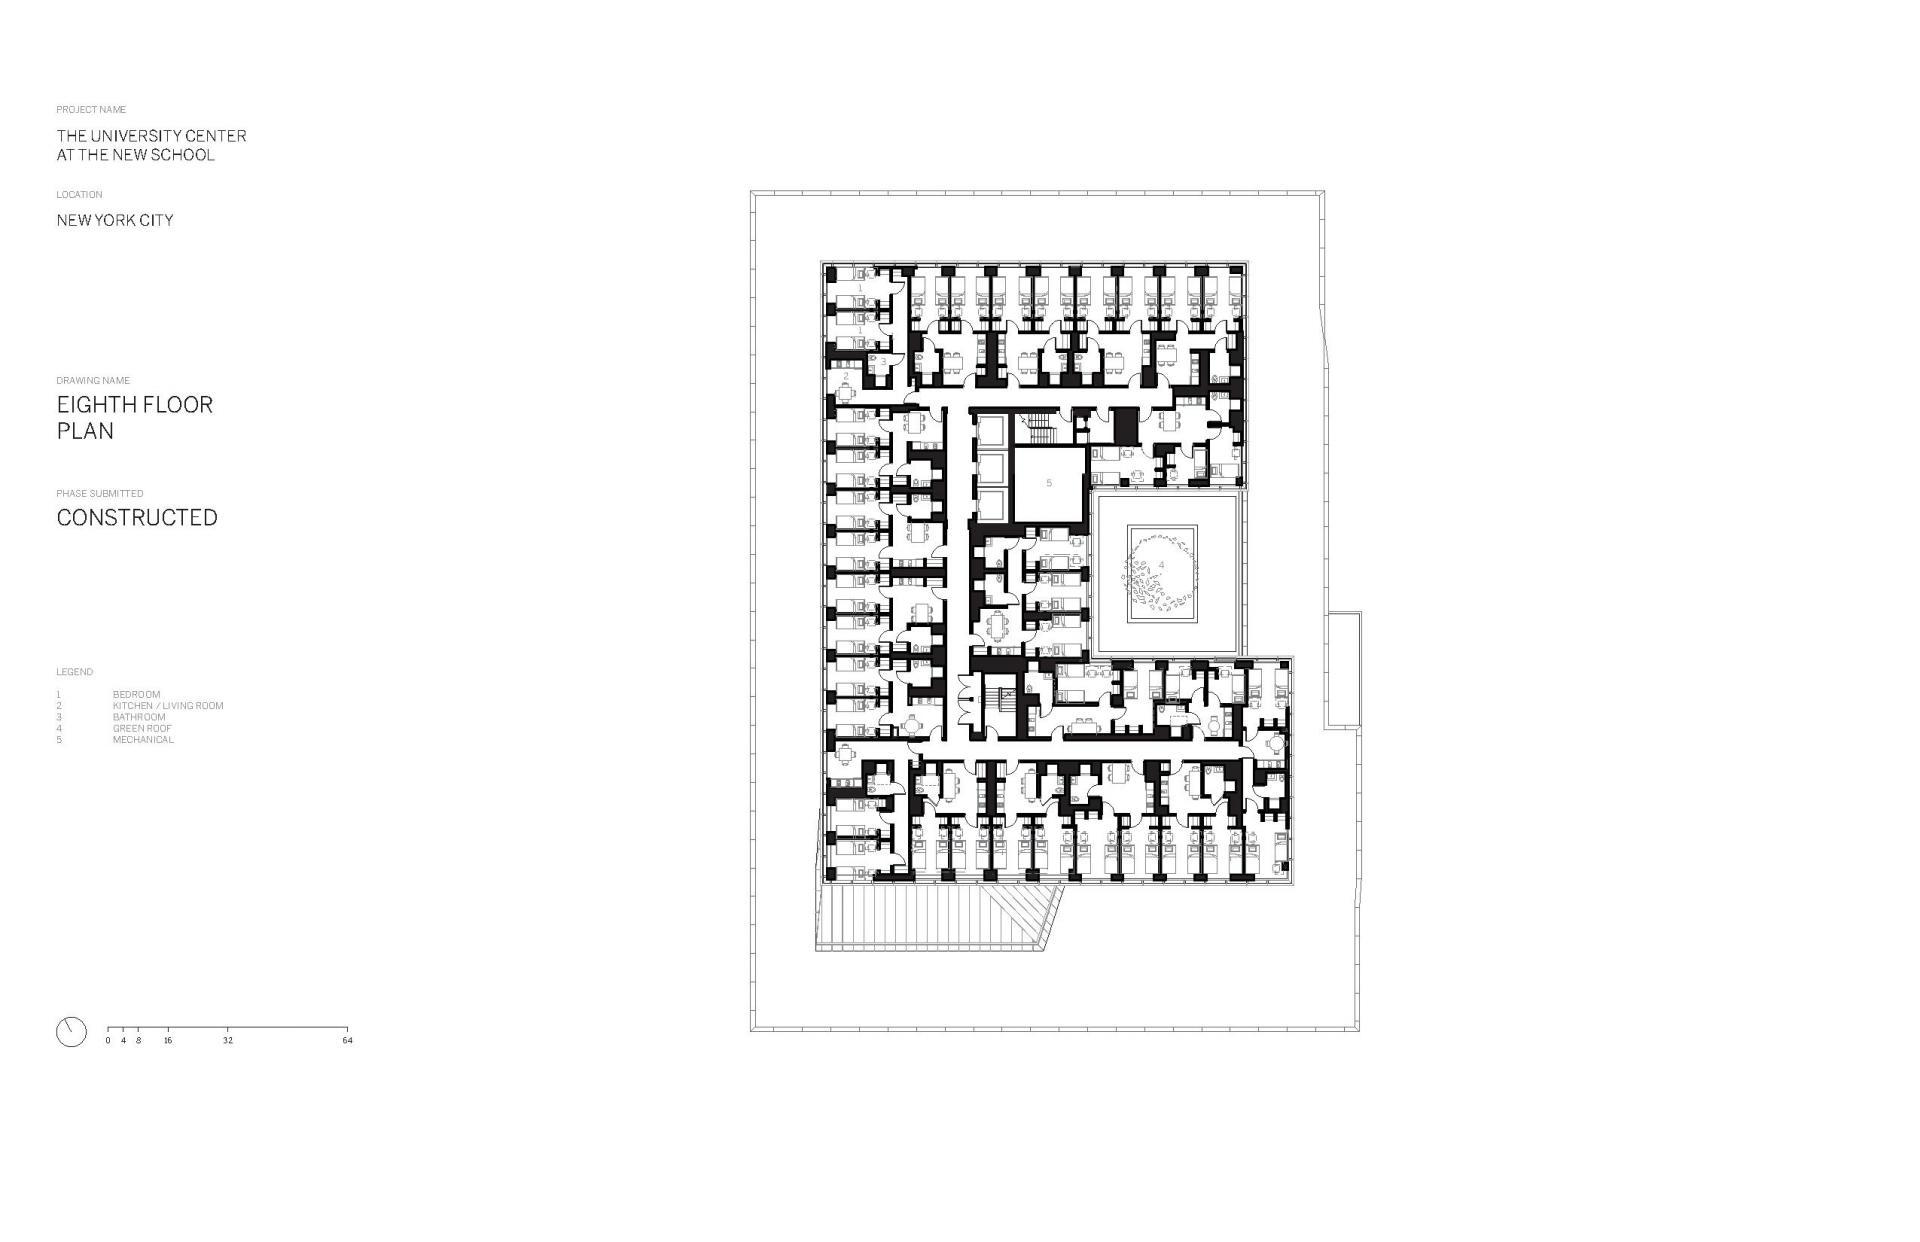 Схема учебного центра Greenwich Village в Нью Йорке - Фото 9